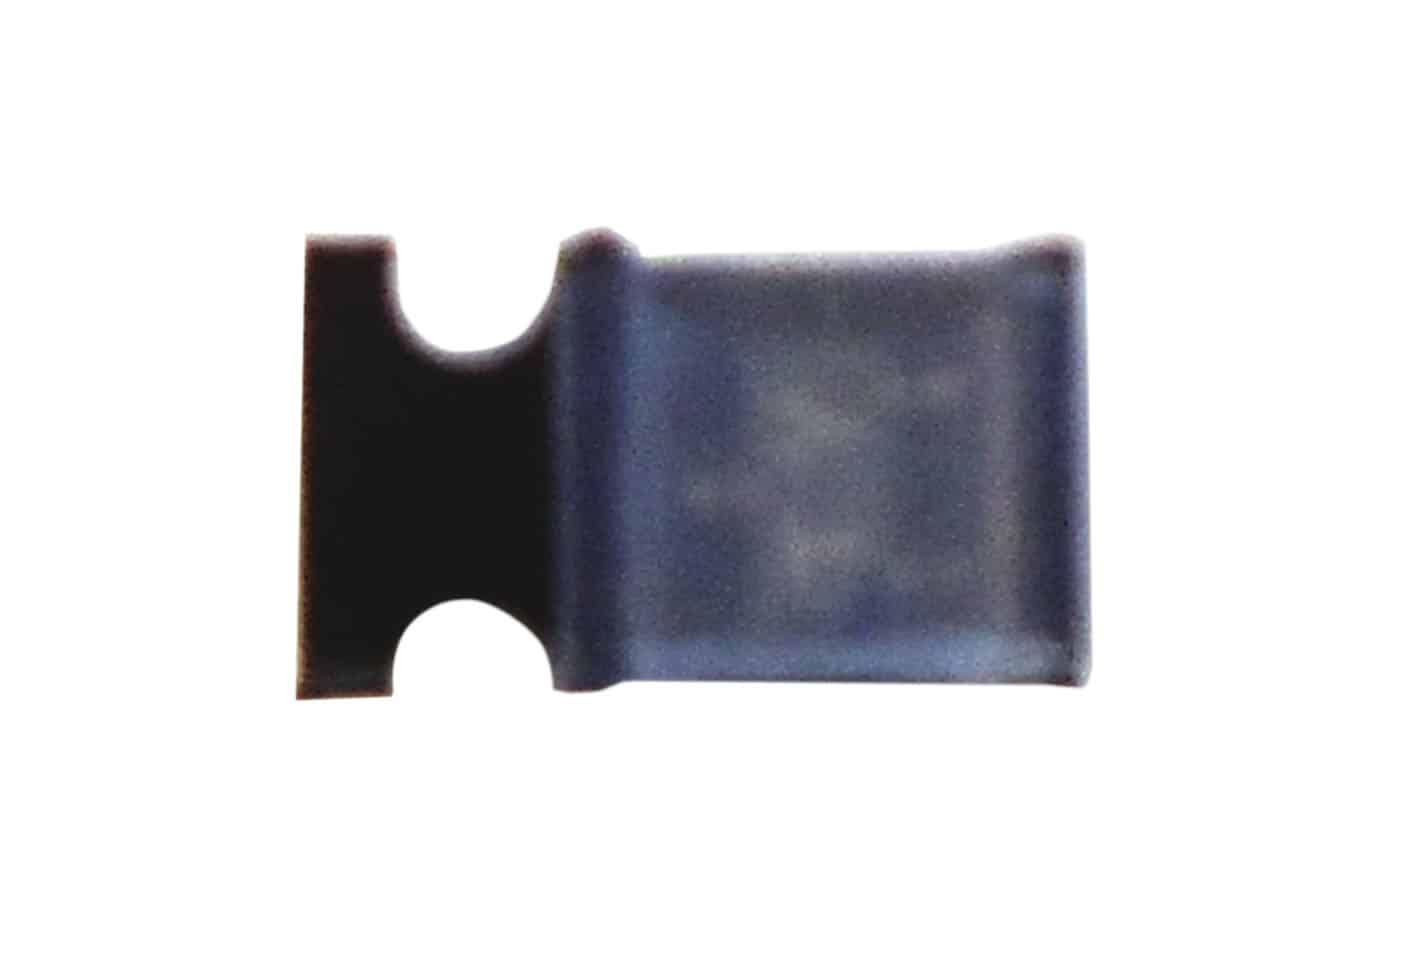 BDCB0302124 - Uniden Inter-Grated Circuit 2Sk302-4